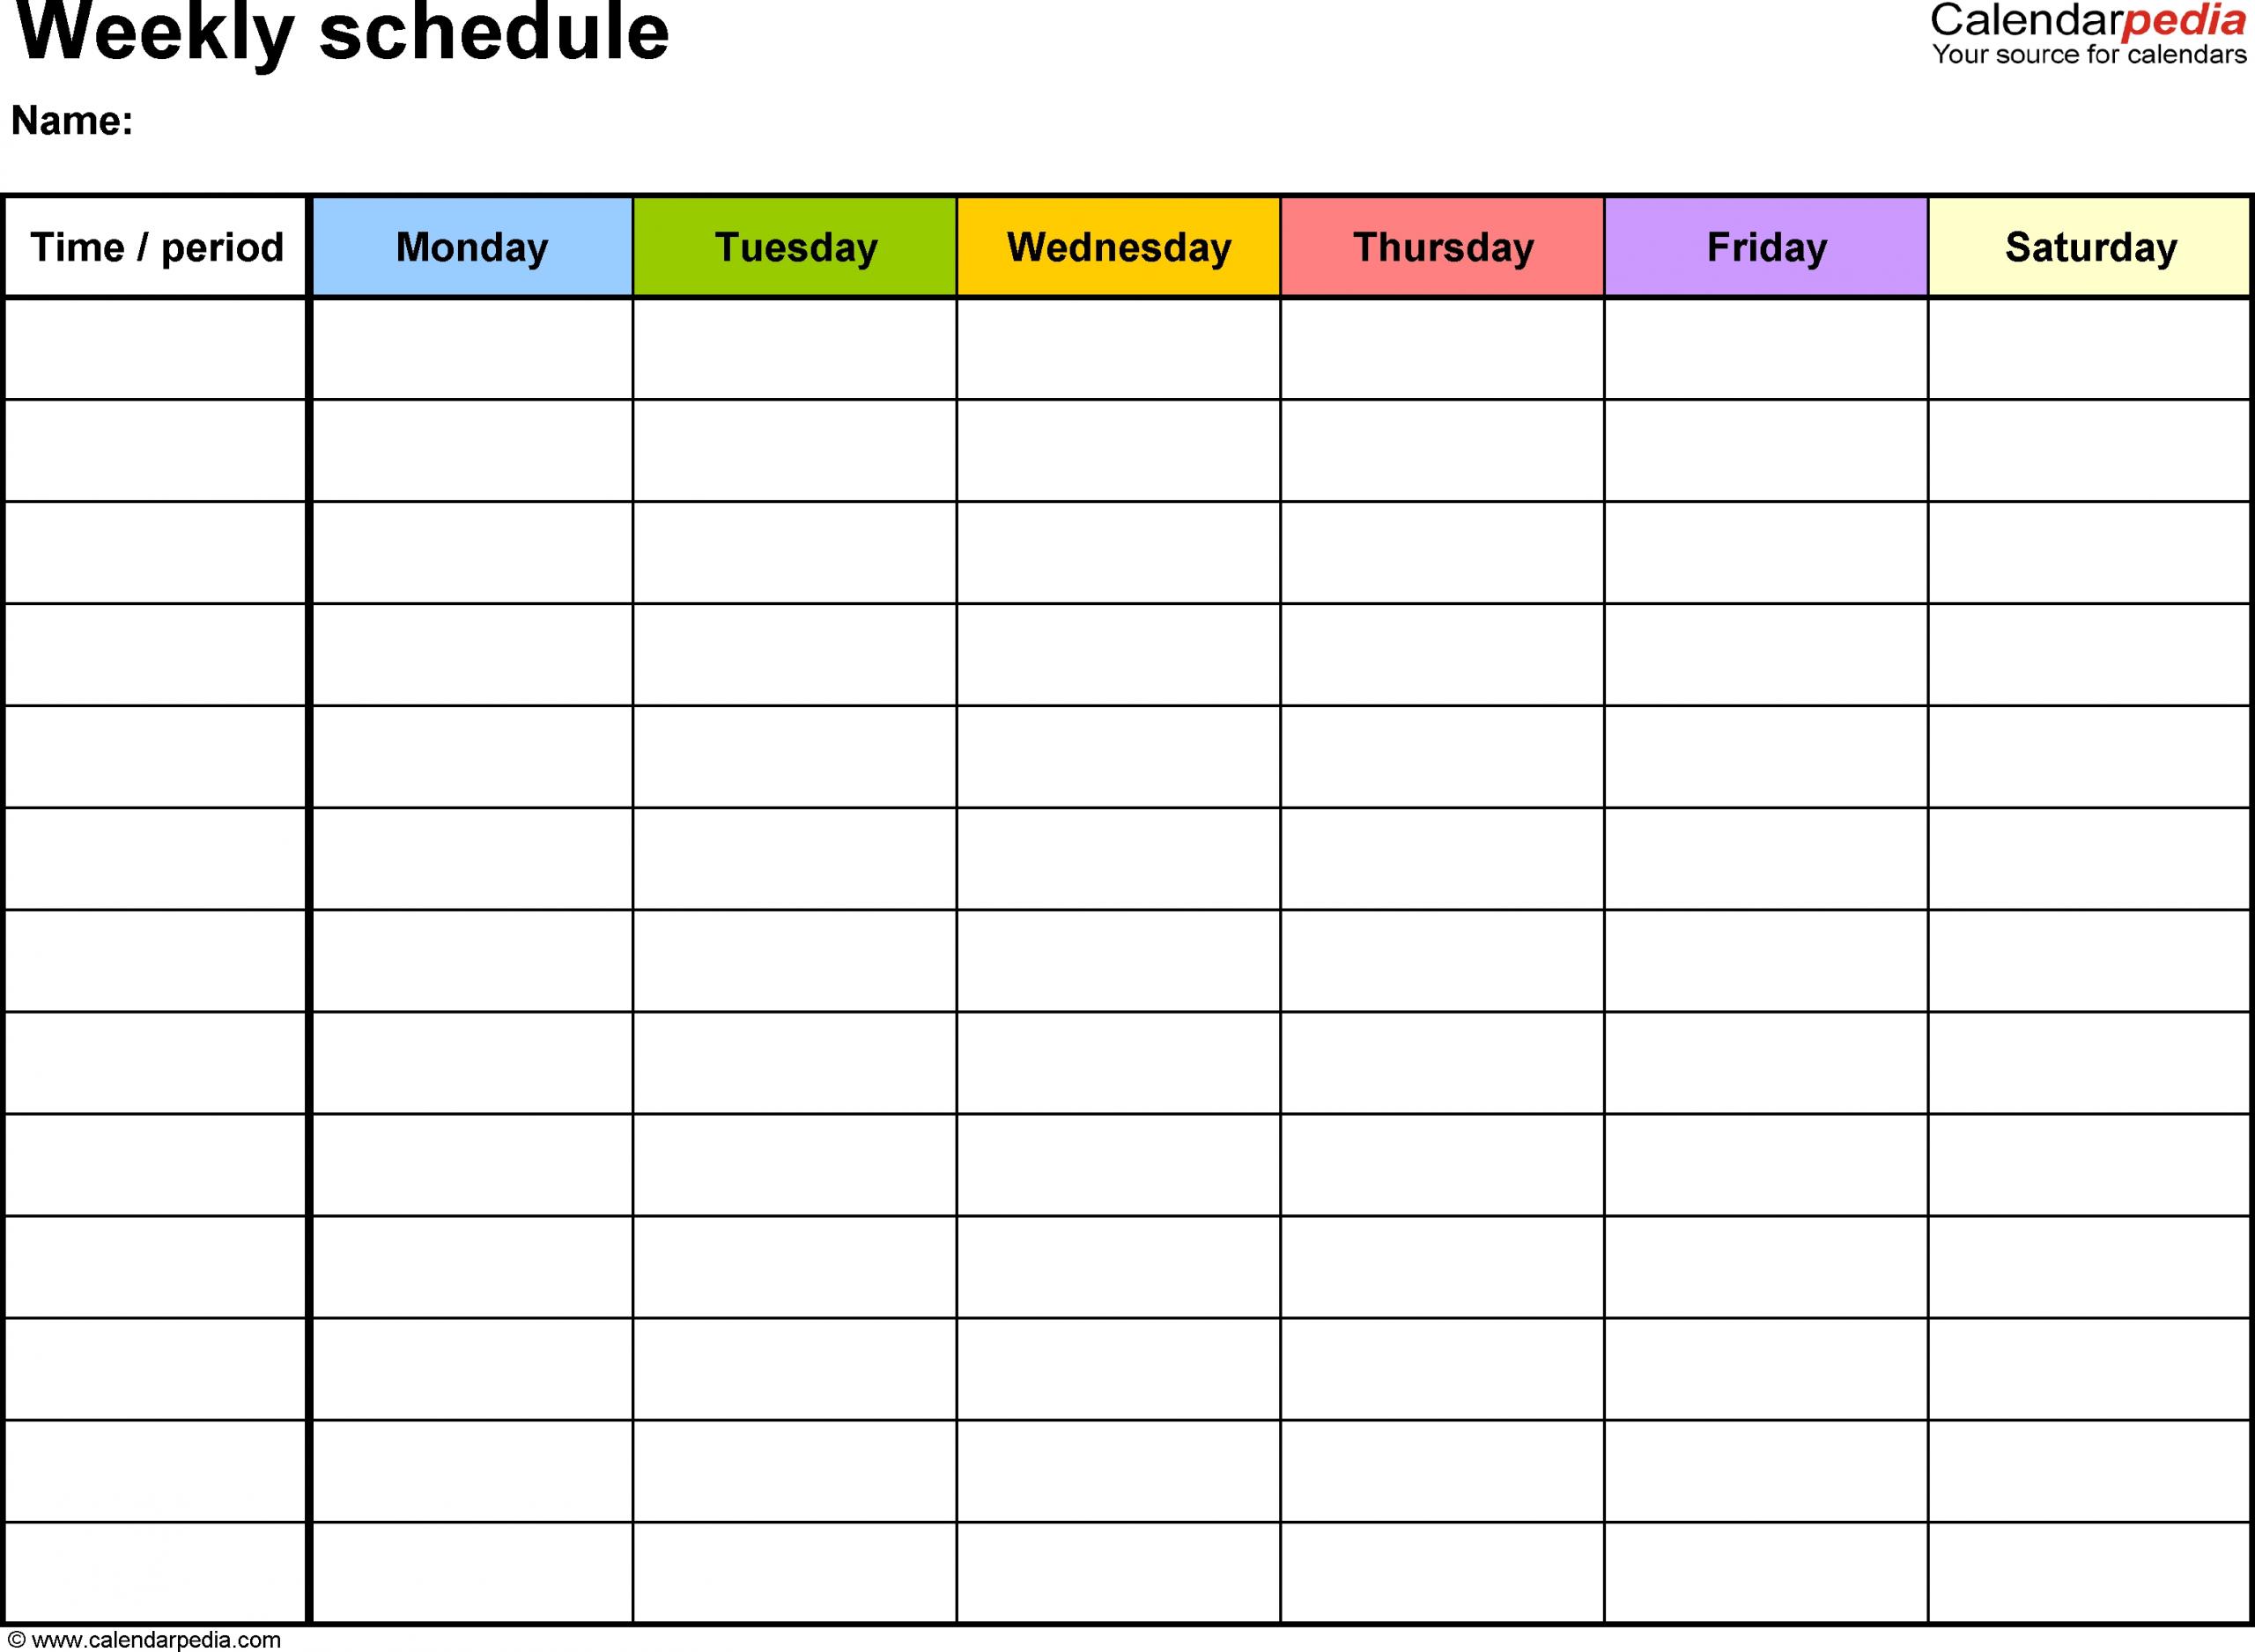 Template Monday To Friday | Calendar Template Printable Printable Weekly Calendar Monday – Friday